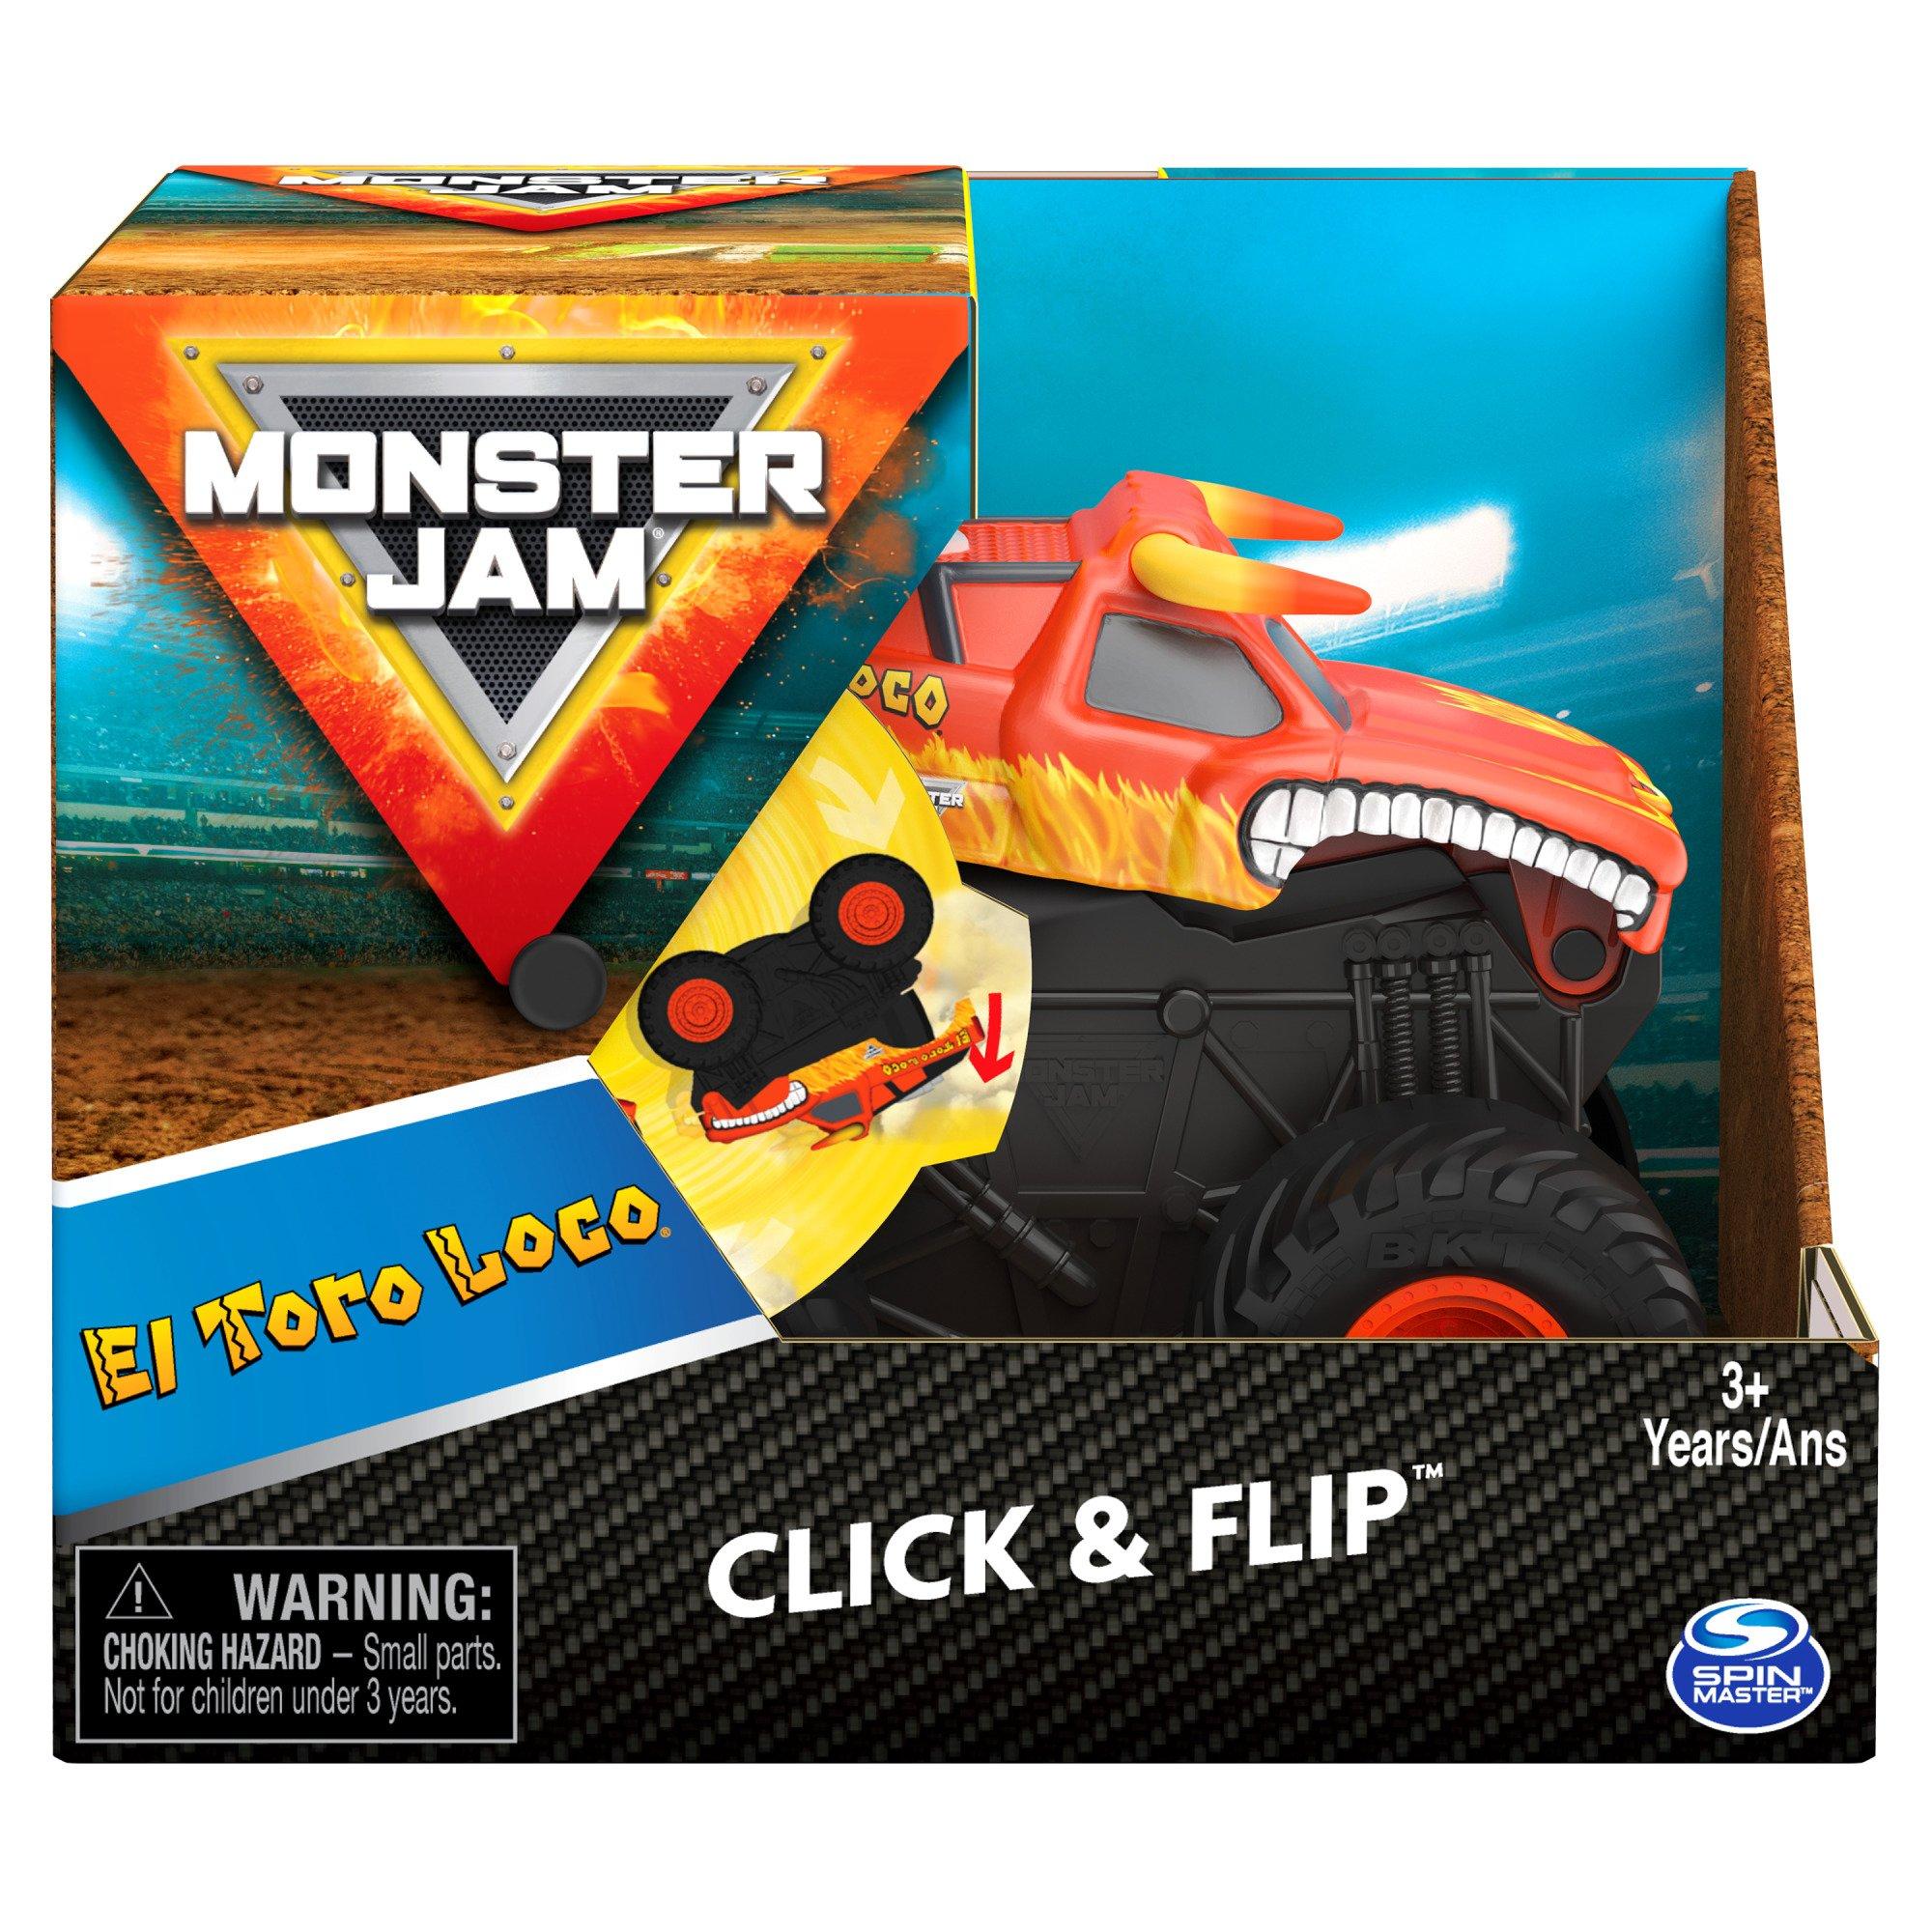 Monster Jam - Click & Flip 1:43 - El Toro Loco